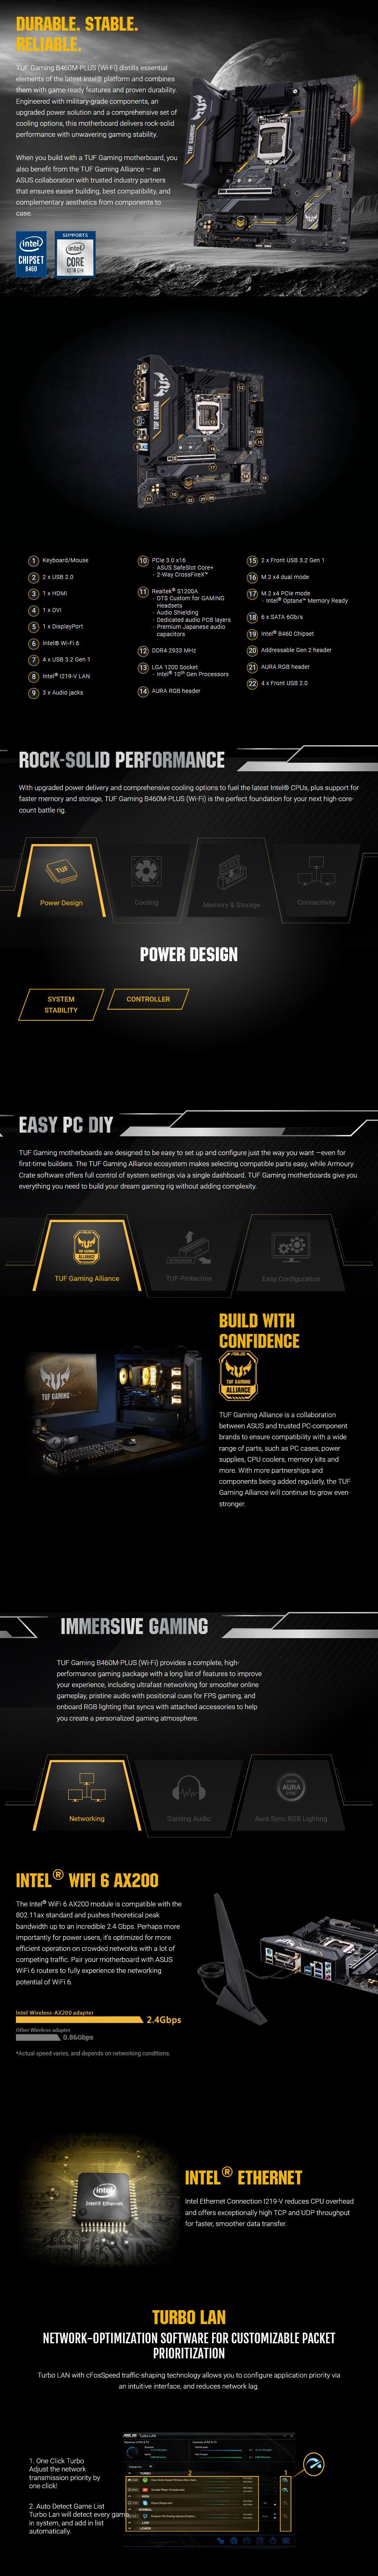 ASUS TUF GAMING B460M-PLUS WIFI LGA 1200 Micro-ATX Motherboard - Overview 1